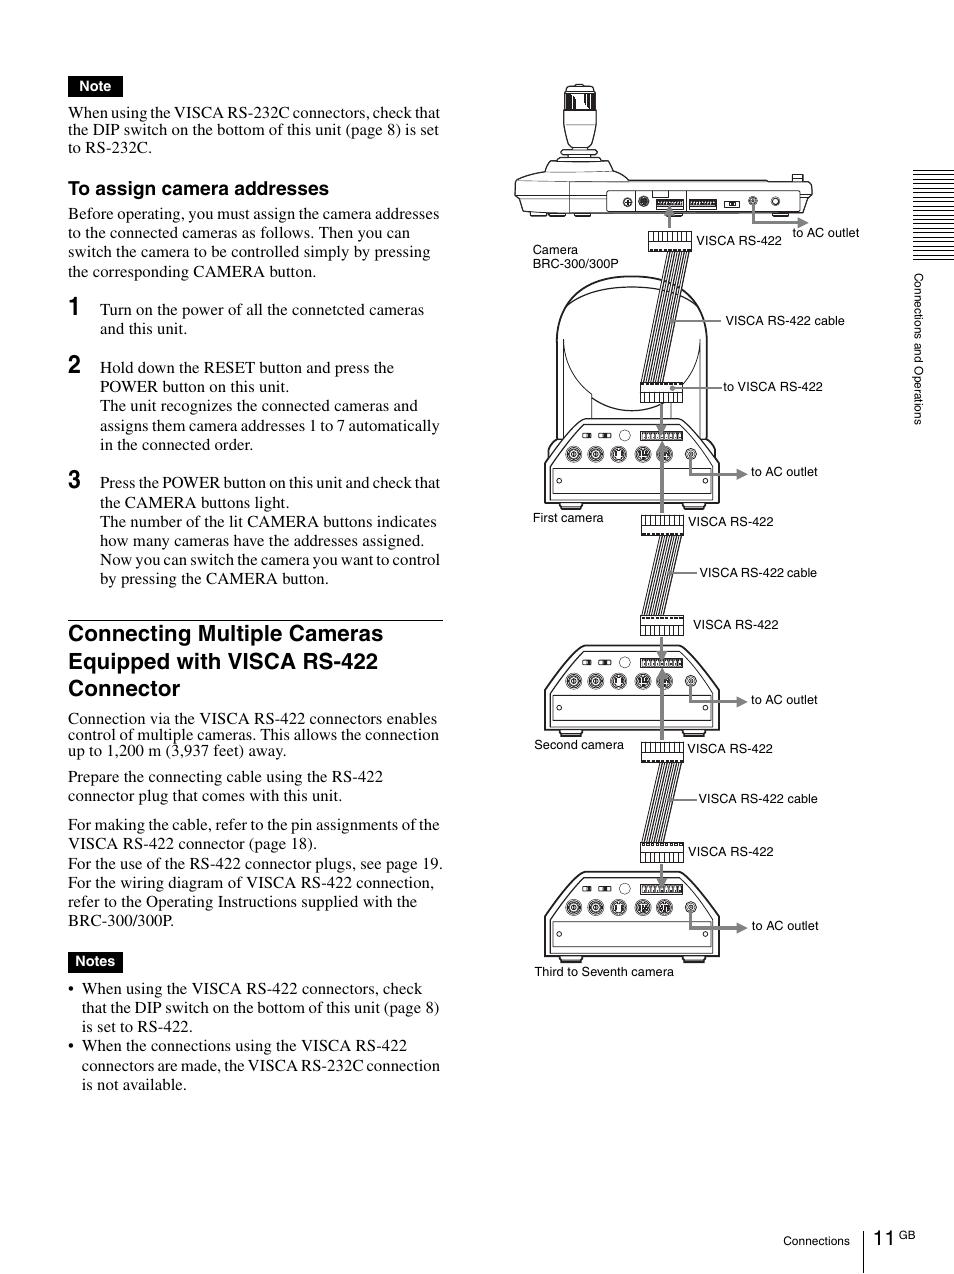 Rs485 Db9 4 Wiring Diagram Ke Buddy Wiring Diagram Kenworth Wiring – Ke Buddy Wiring Diagram